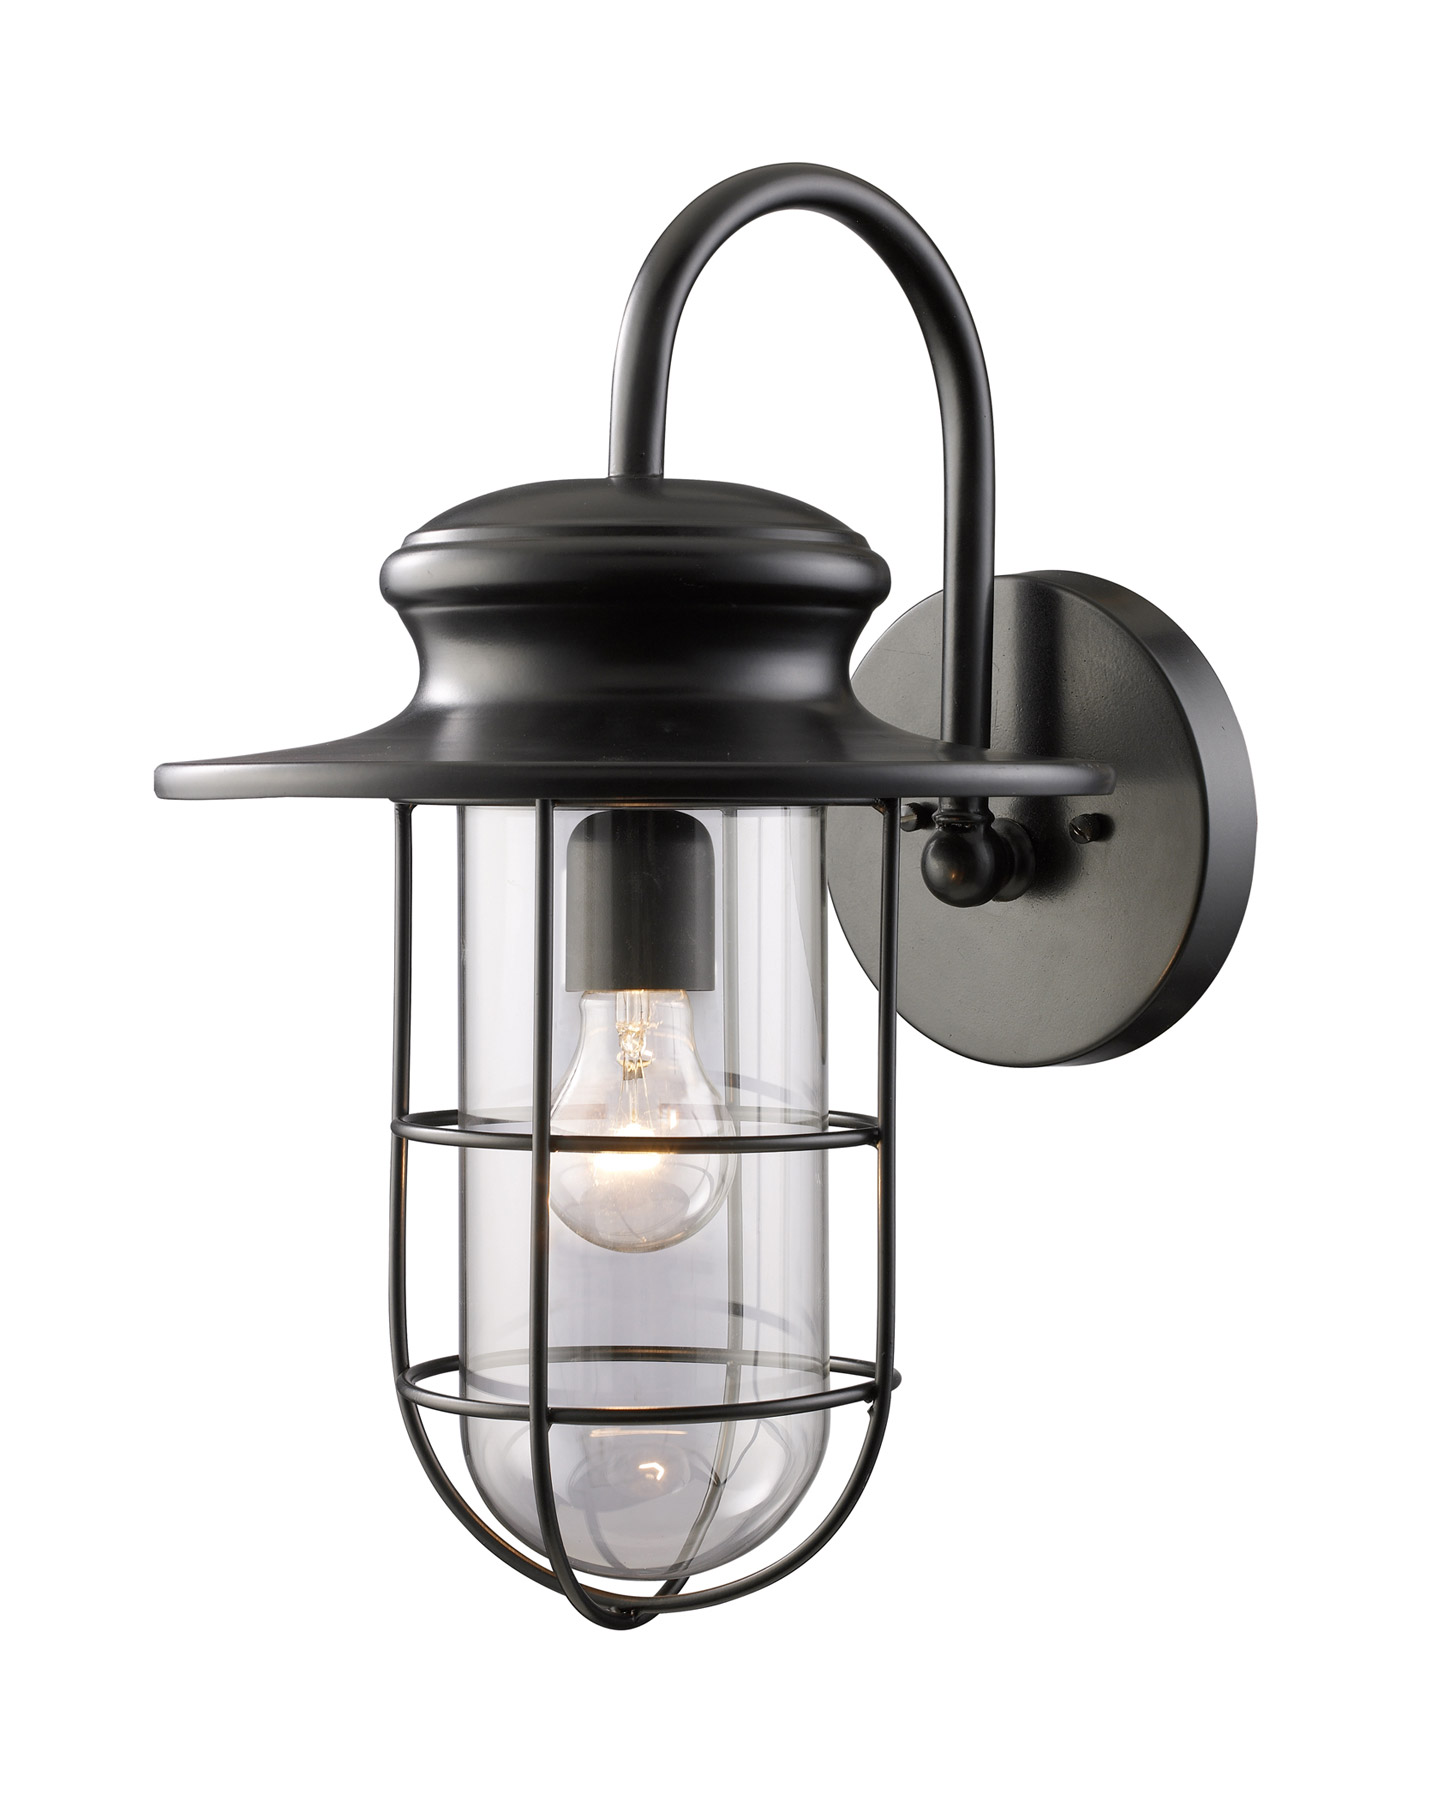 Elk Lighting 42285 1 Portside Outdoor Wall Mount Lantern